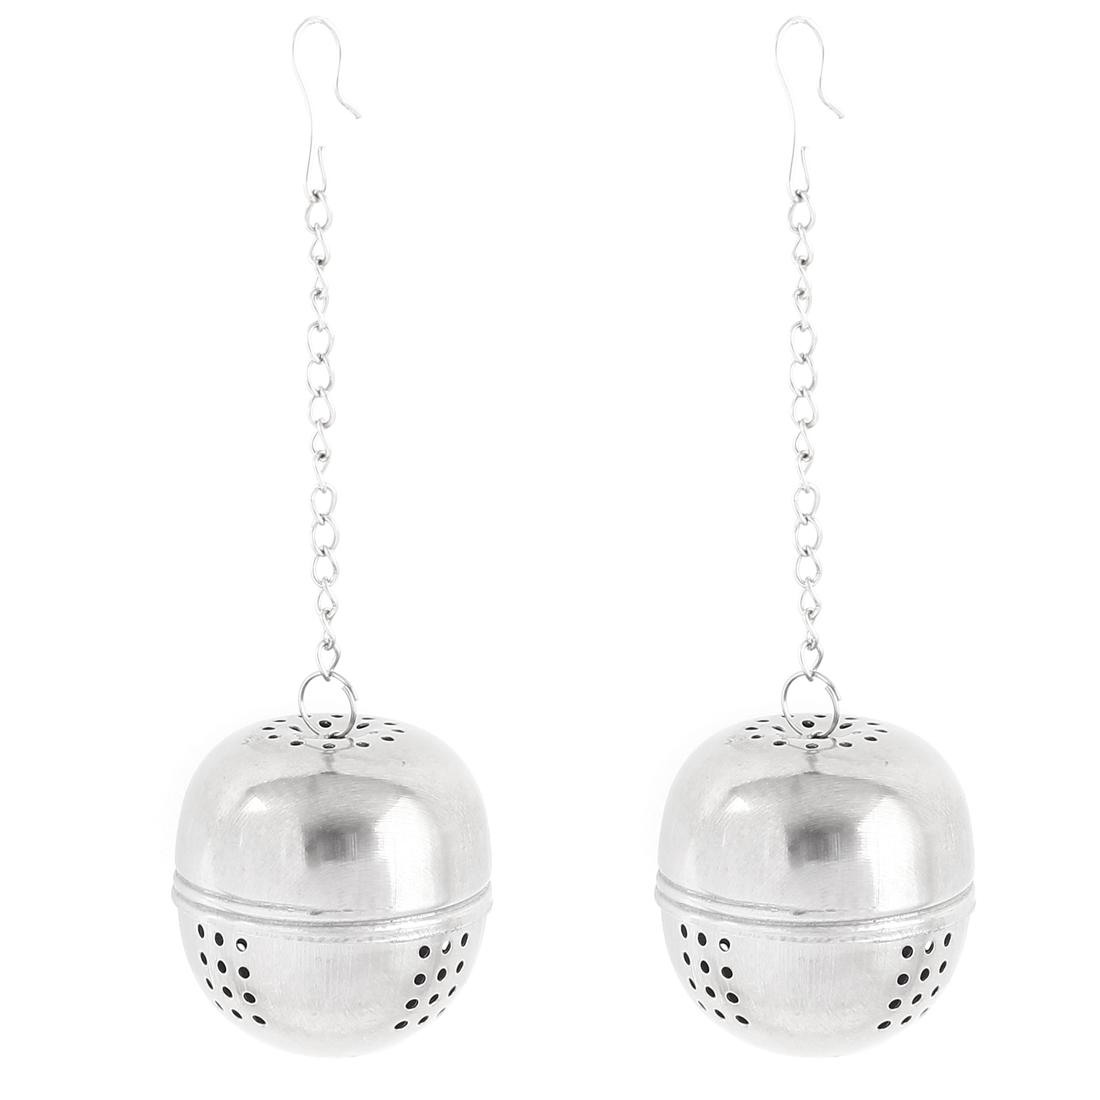 2pcs 4cm Dia Stainless Steel Ball Strainer Tea Leaf Spice Perfume Infuser